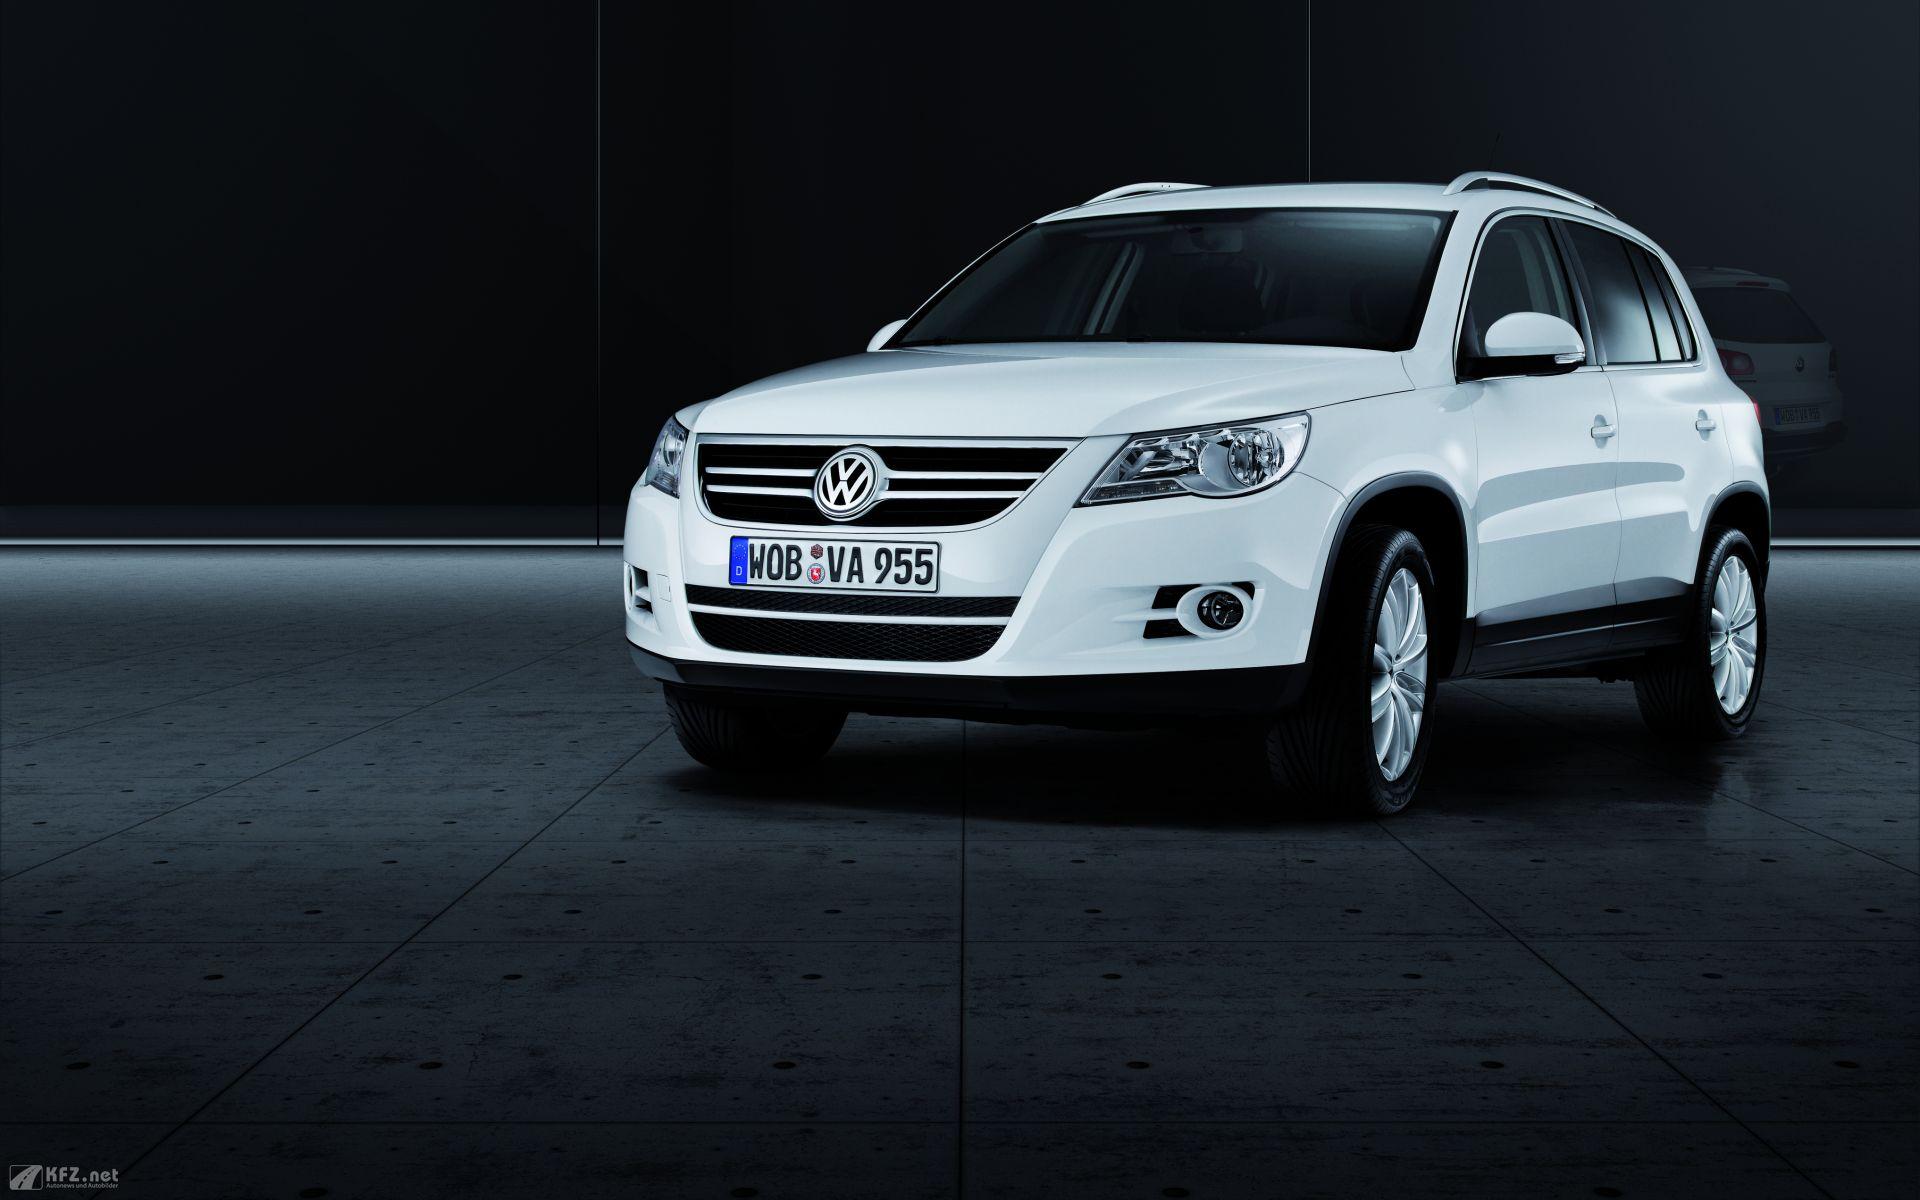 Volkswagen Wallpaper HD White